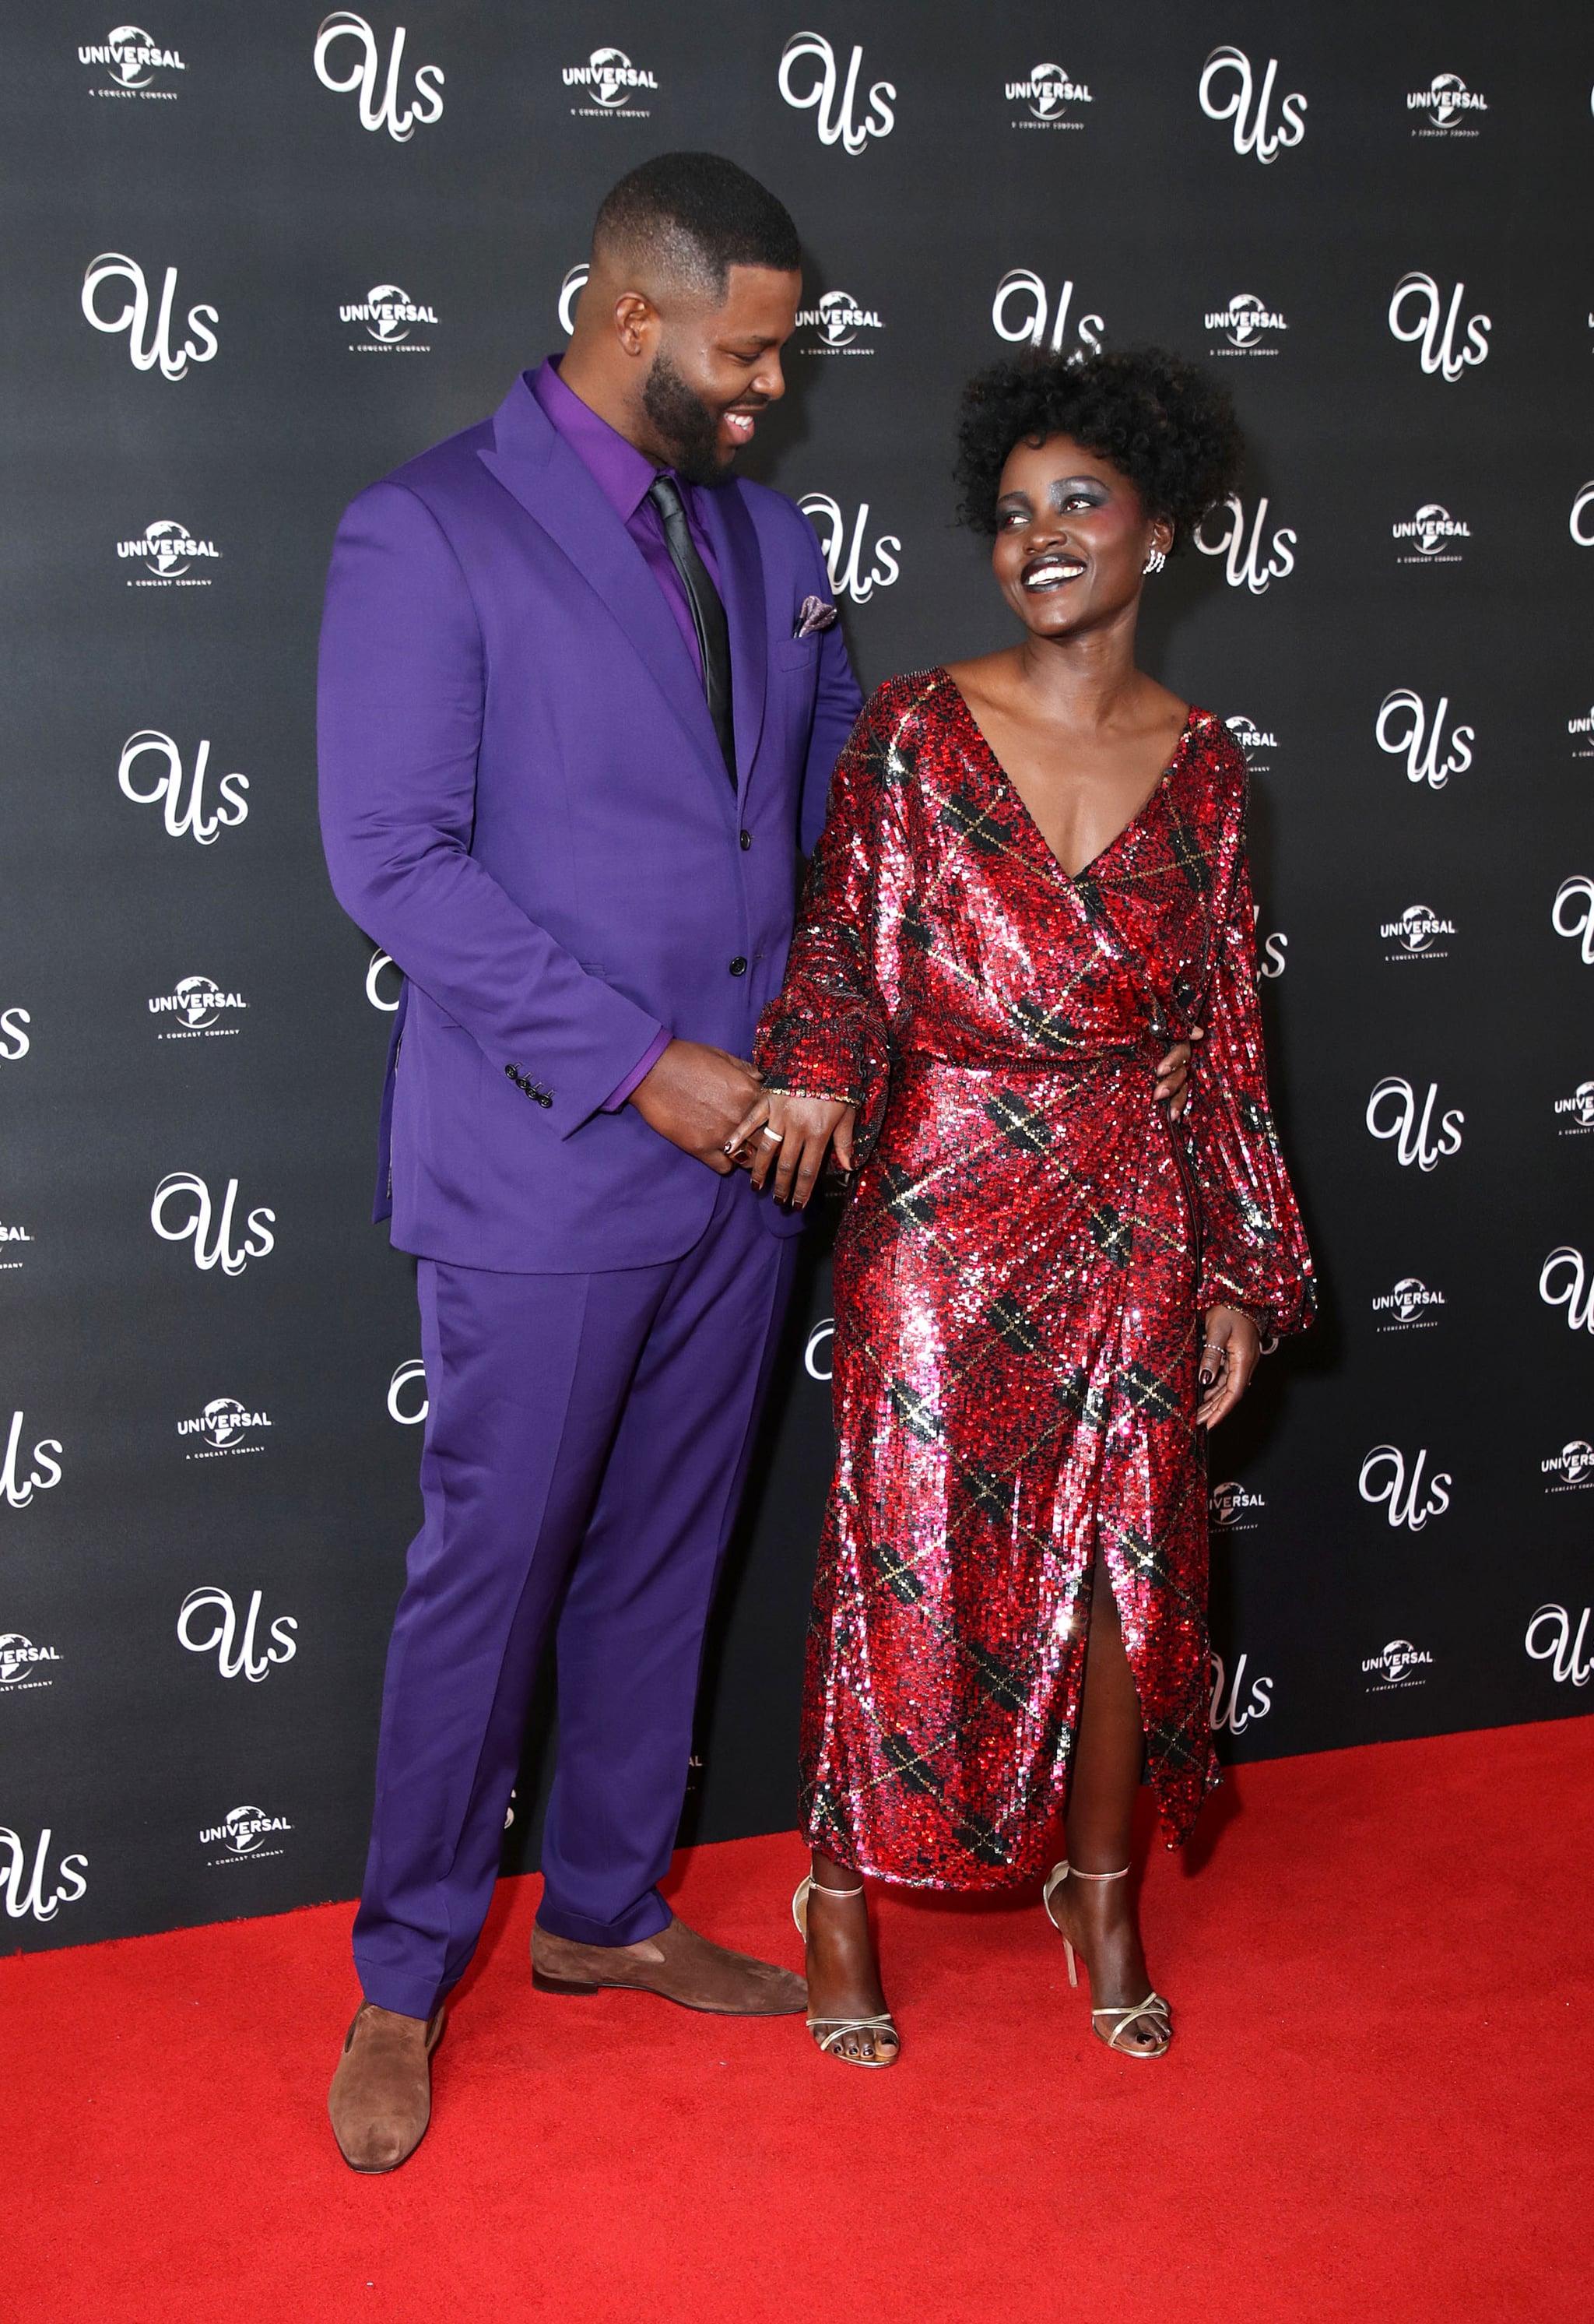 Lupita Nyong O Winston Duke At Us Screening In London 2019 Popsugar Celebrity